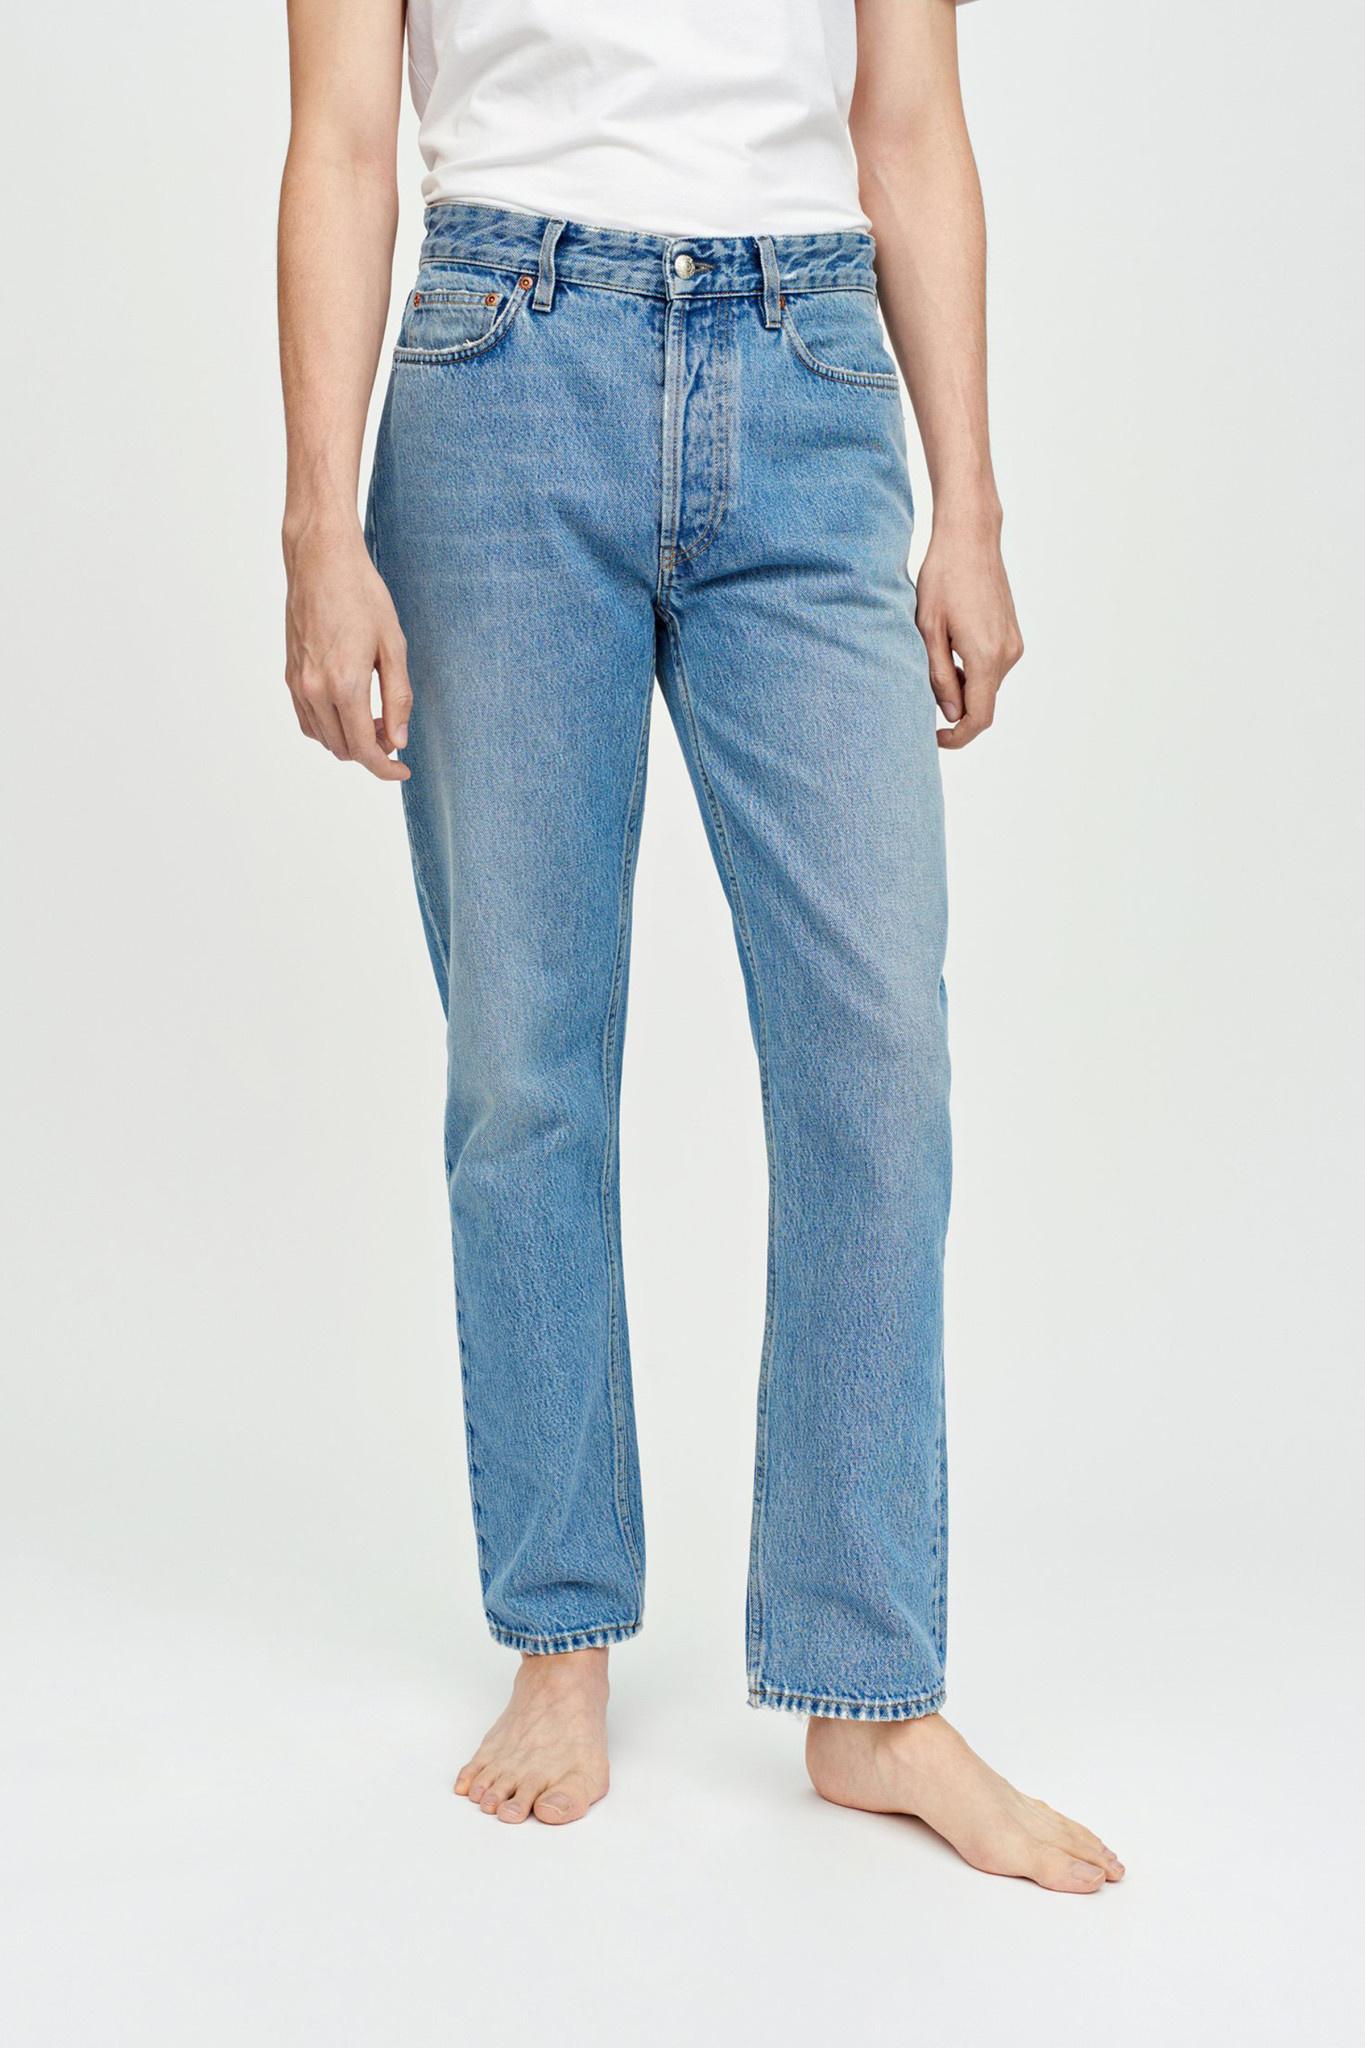 Bill Jeans - Wash 4-1